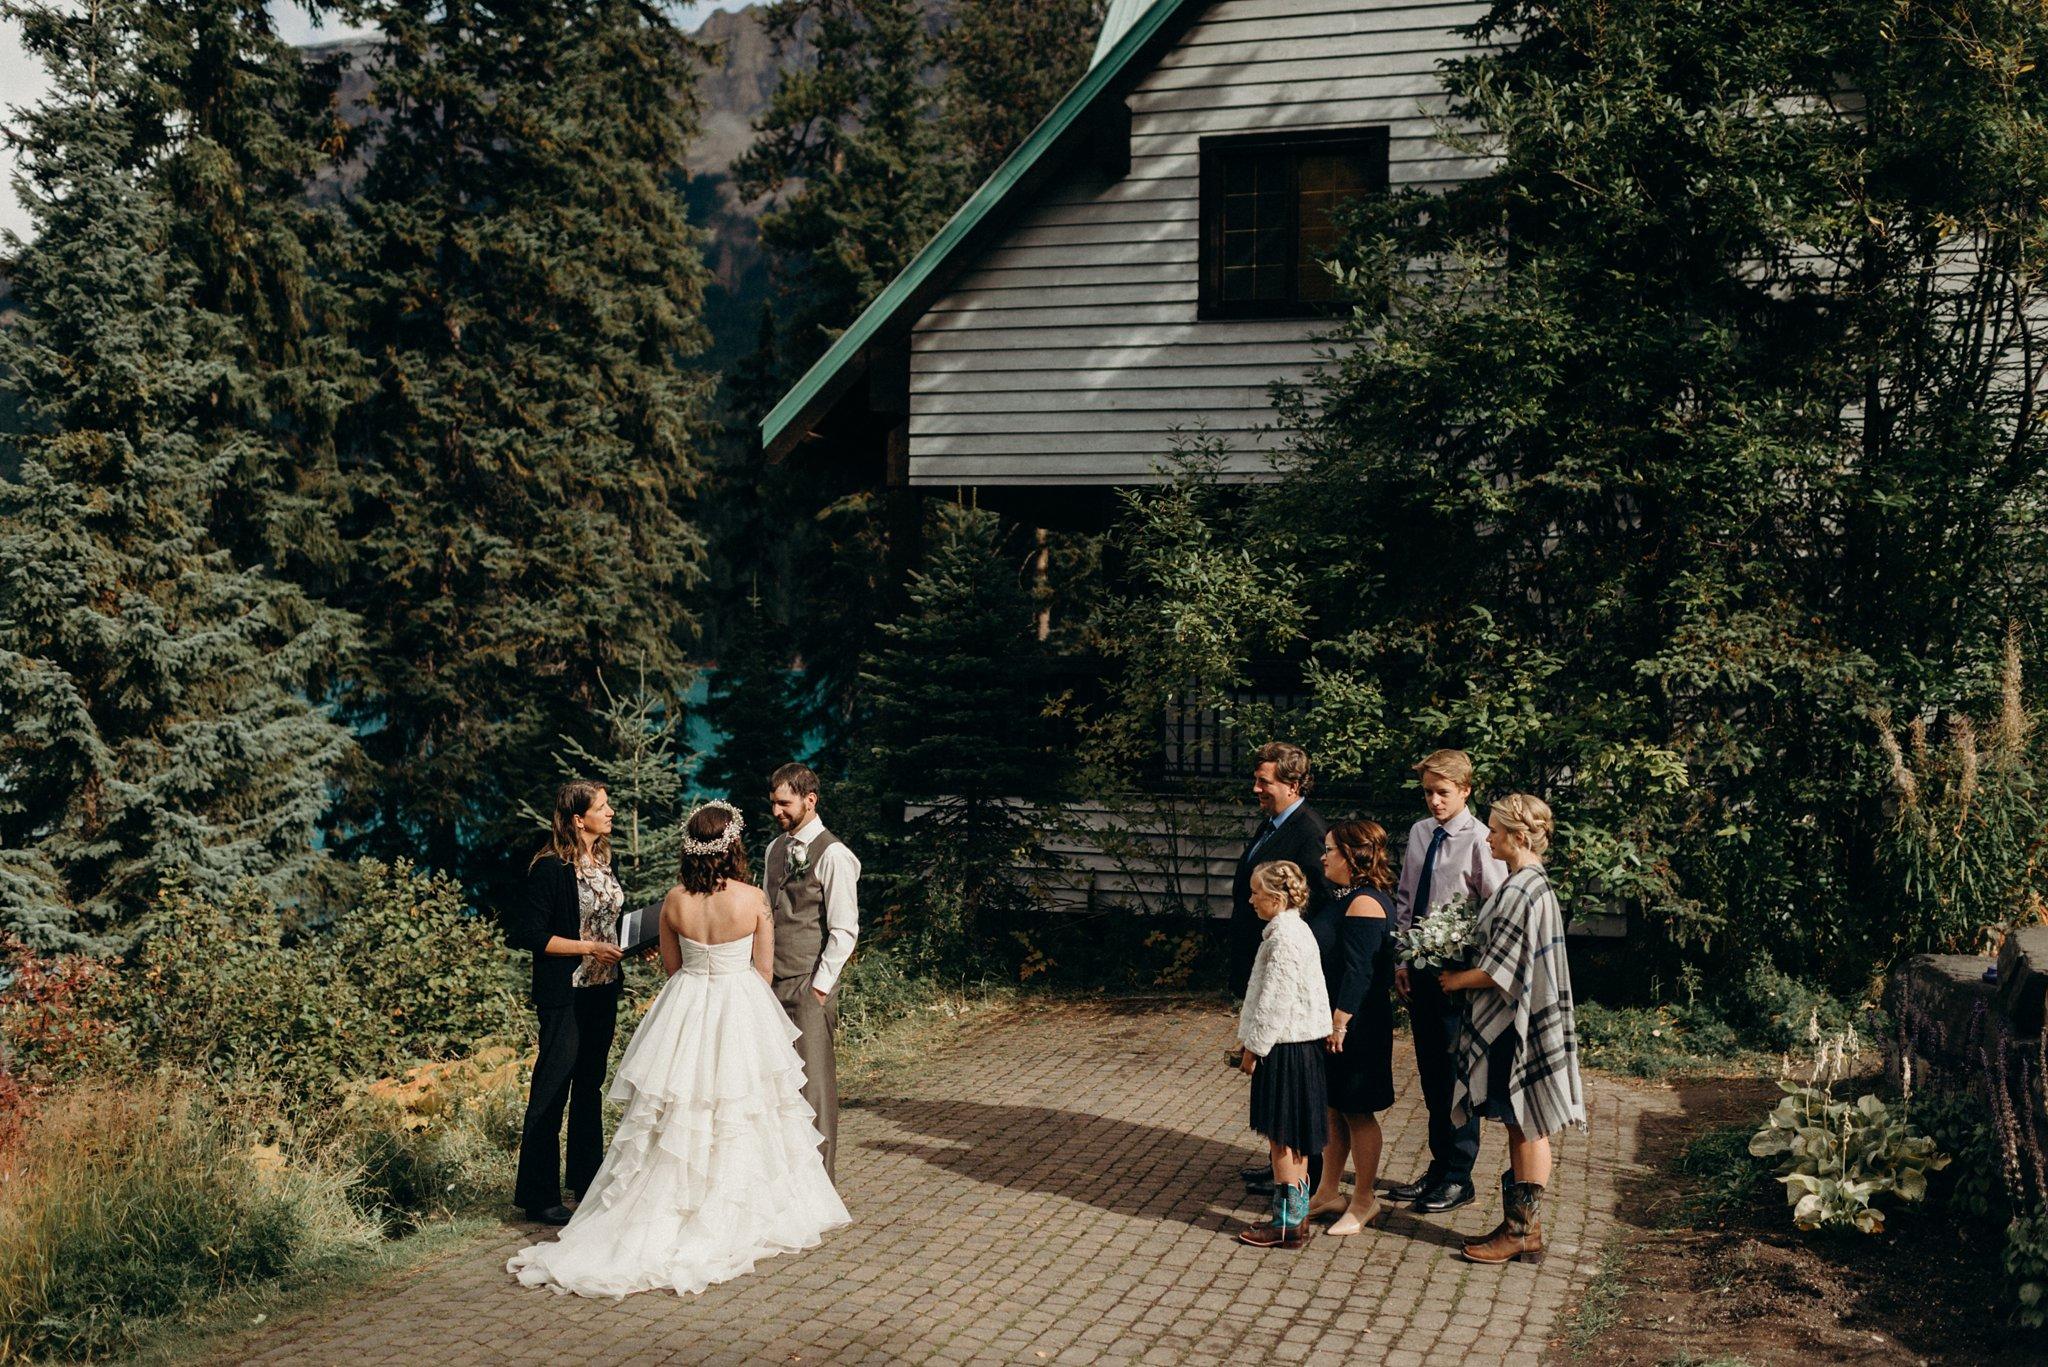 kaihla_tonai_intimate_wedding_elopement_photographer_6891.jpg